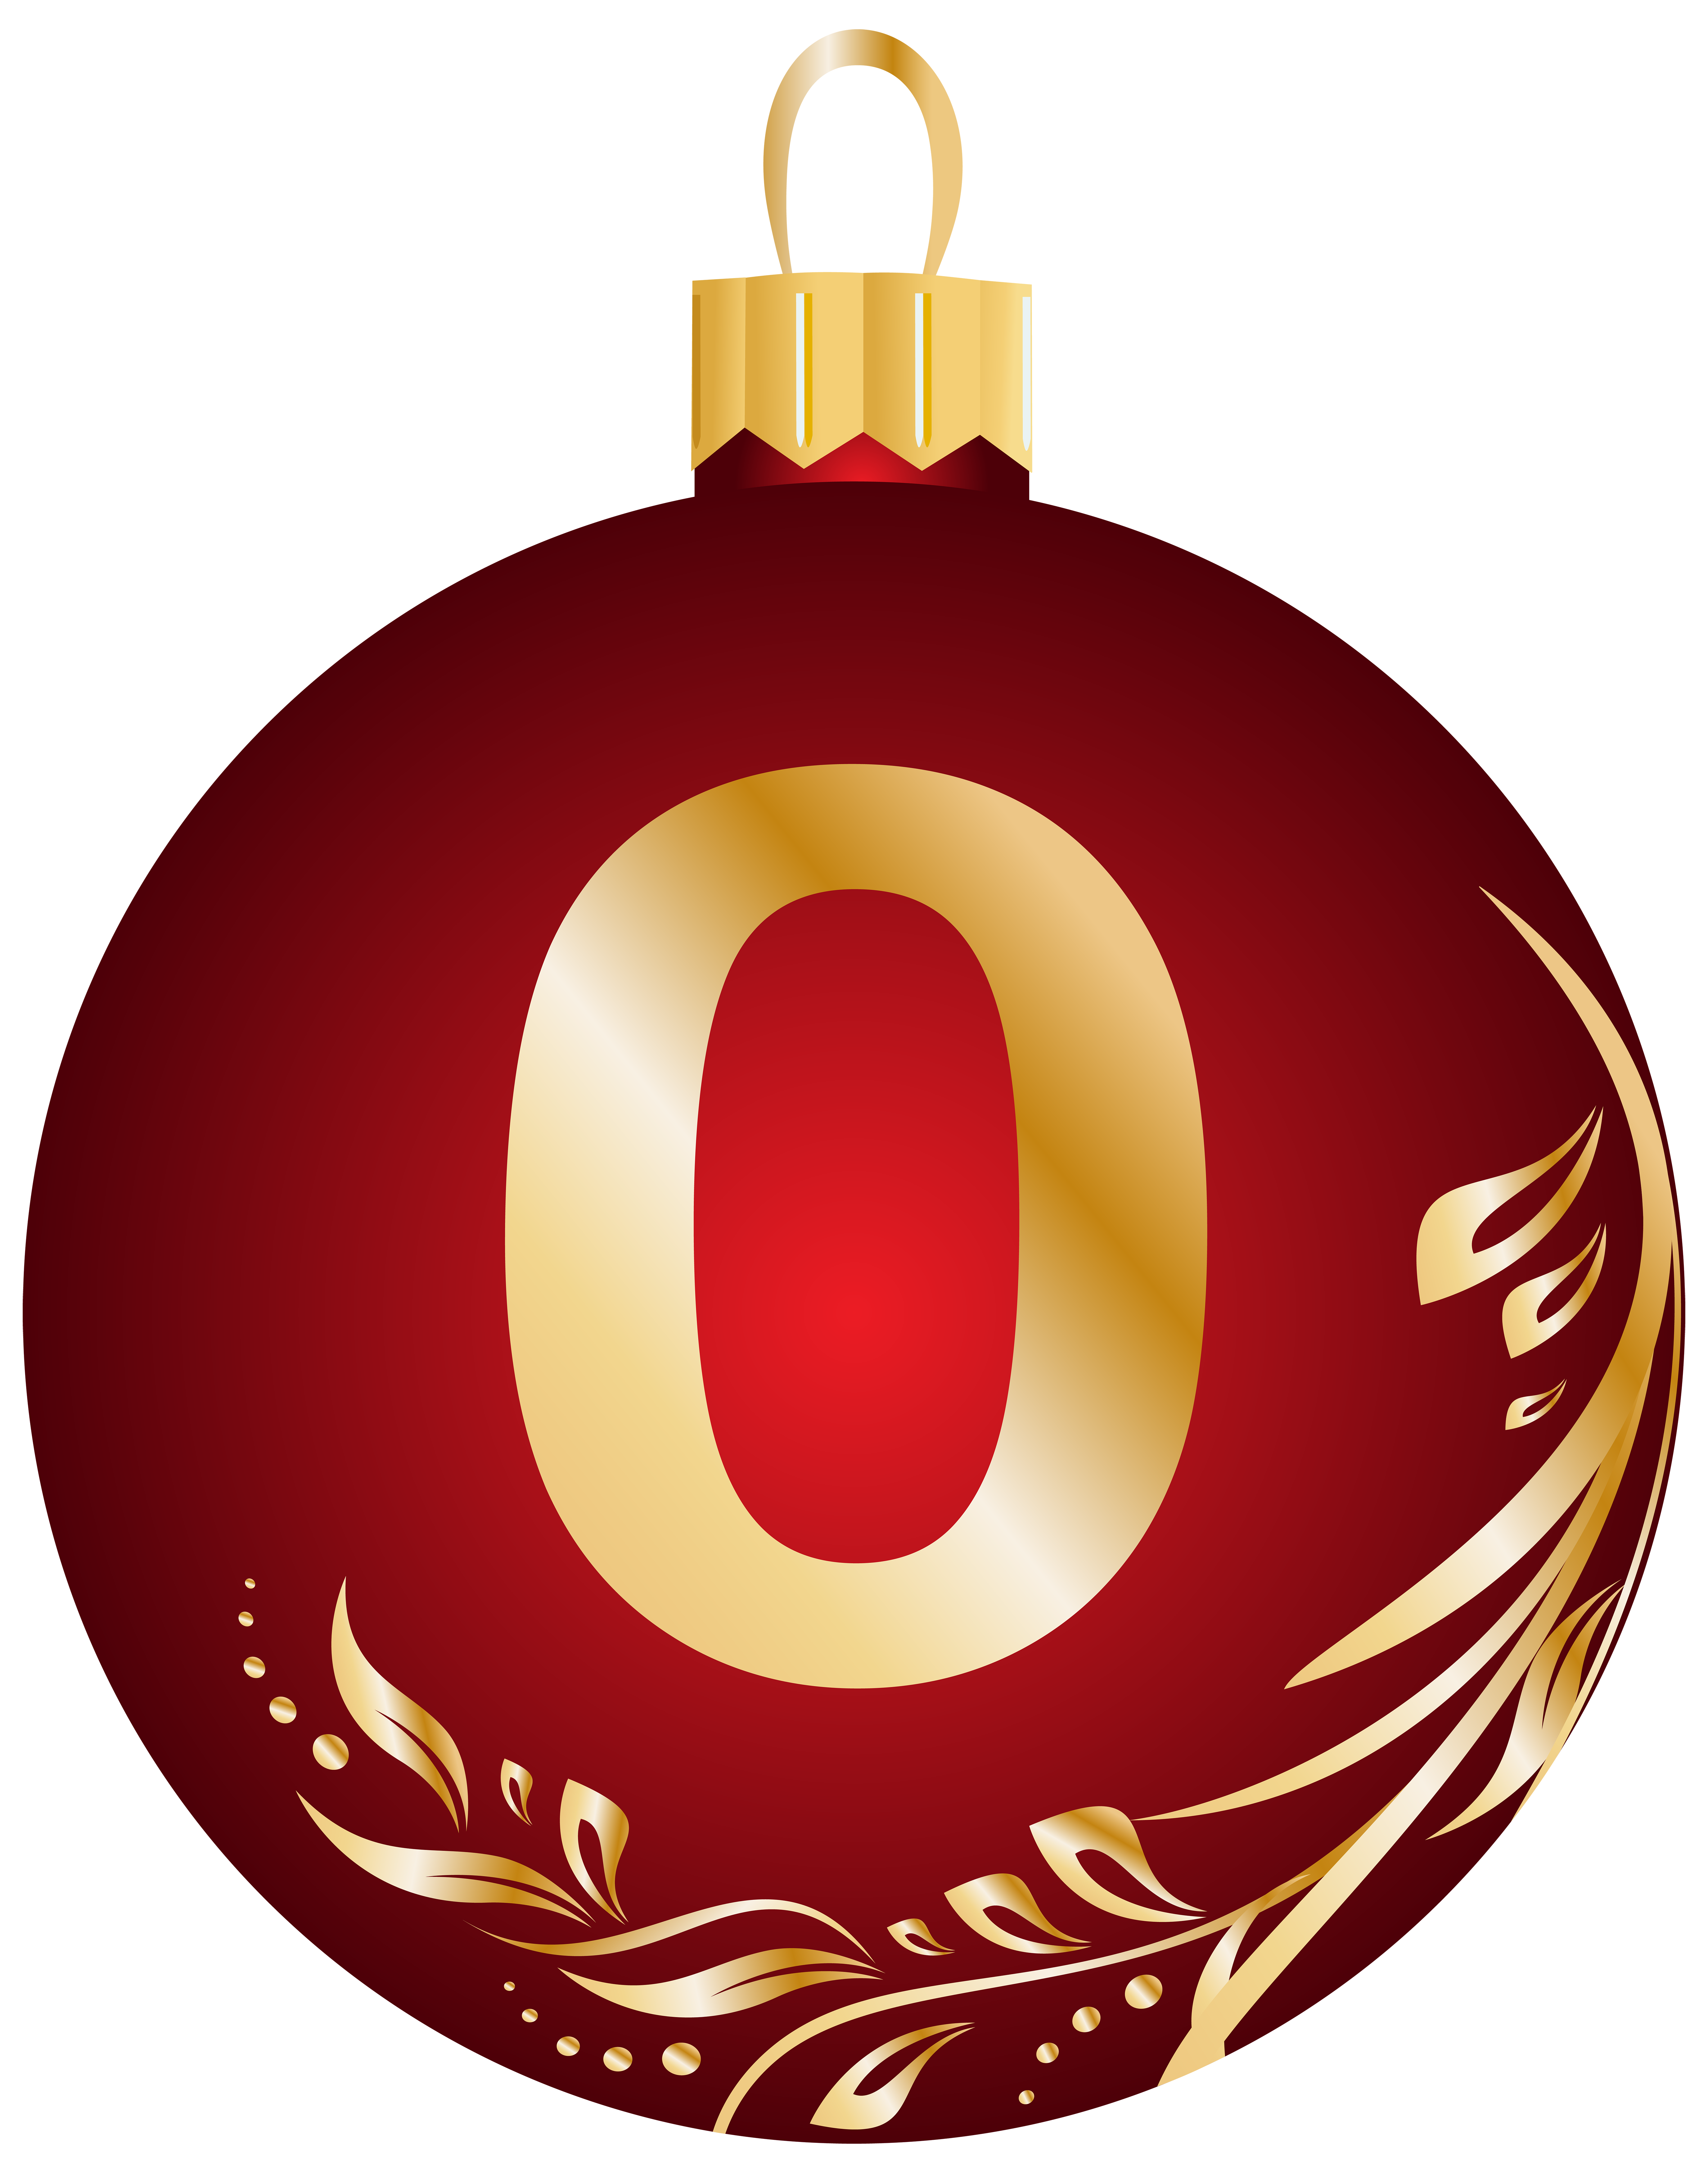 Winter ball snowflake clipart svg royalty free download Christmas Ball Clipart at GetDrawings.com | Free for personal use ... svg royalty free download